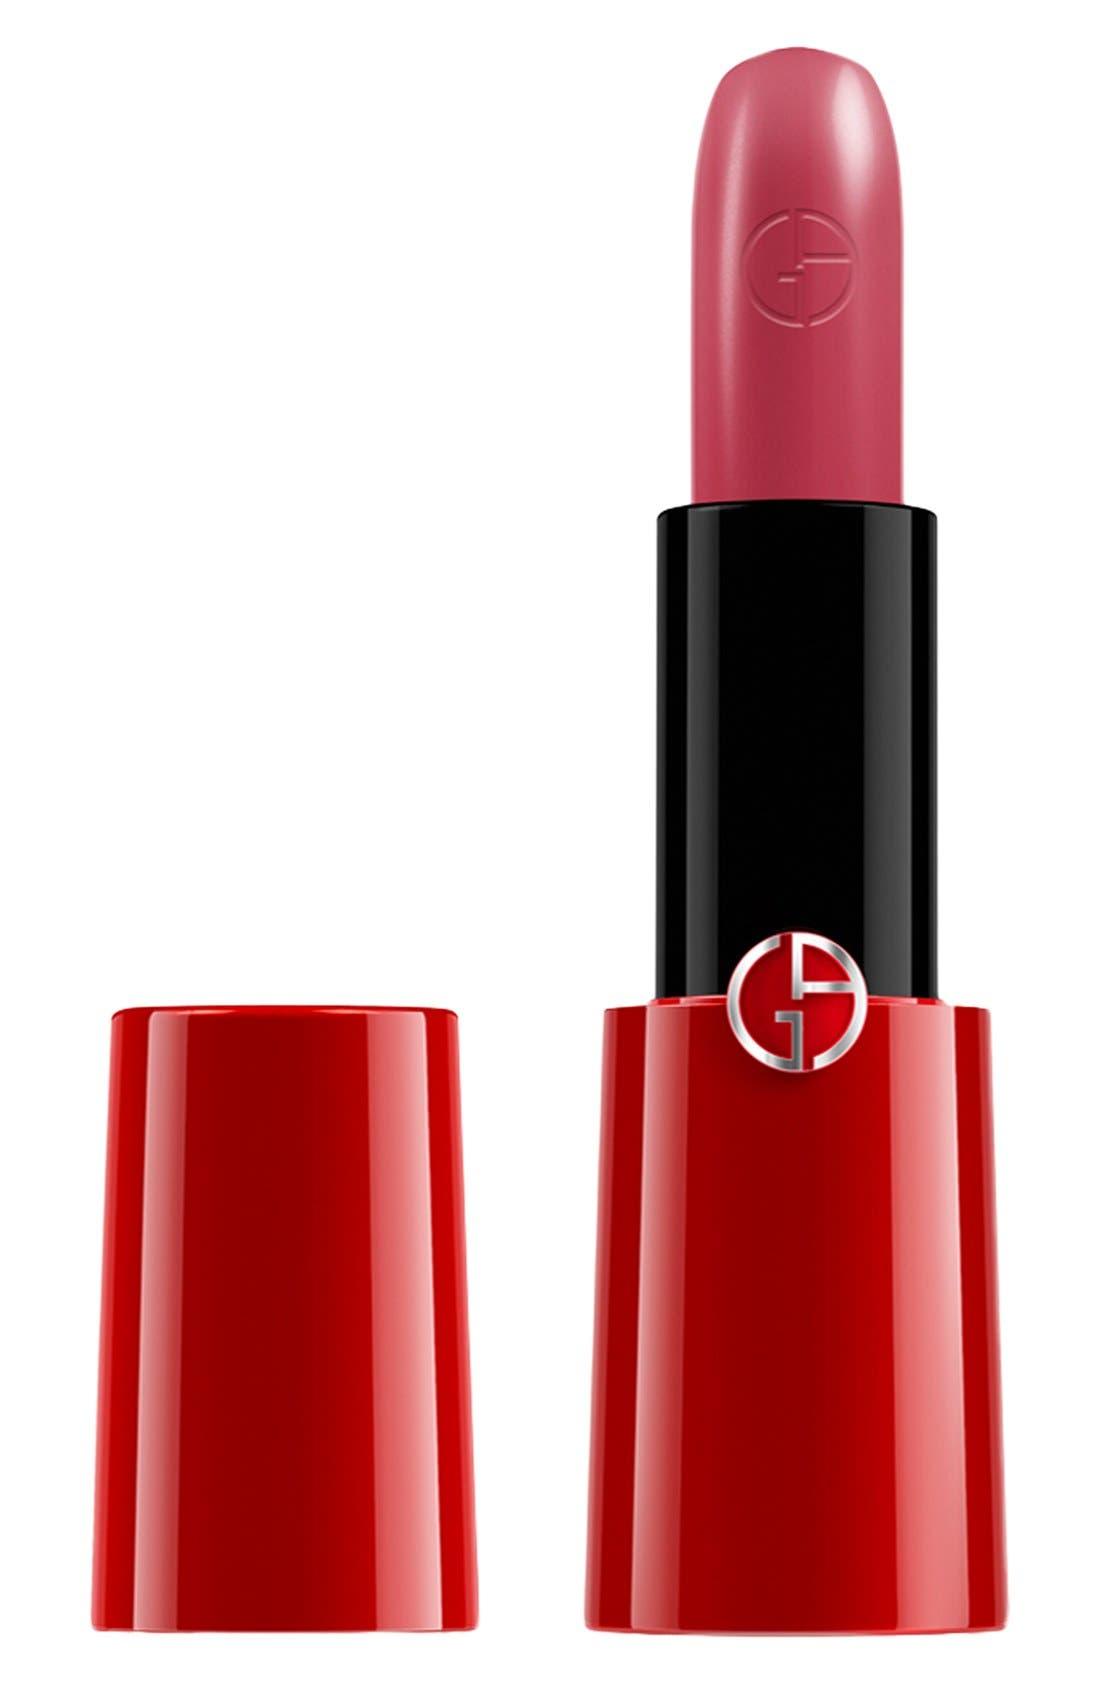 Giorgio Armani Rouge Ecstasy Lipstick